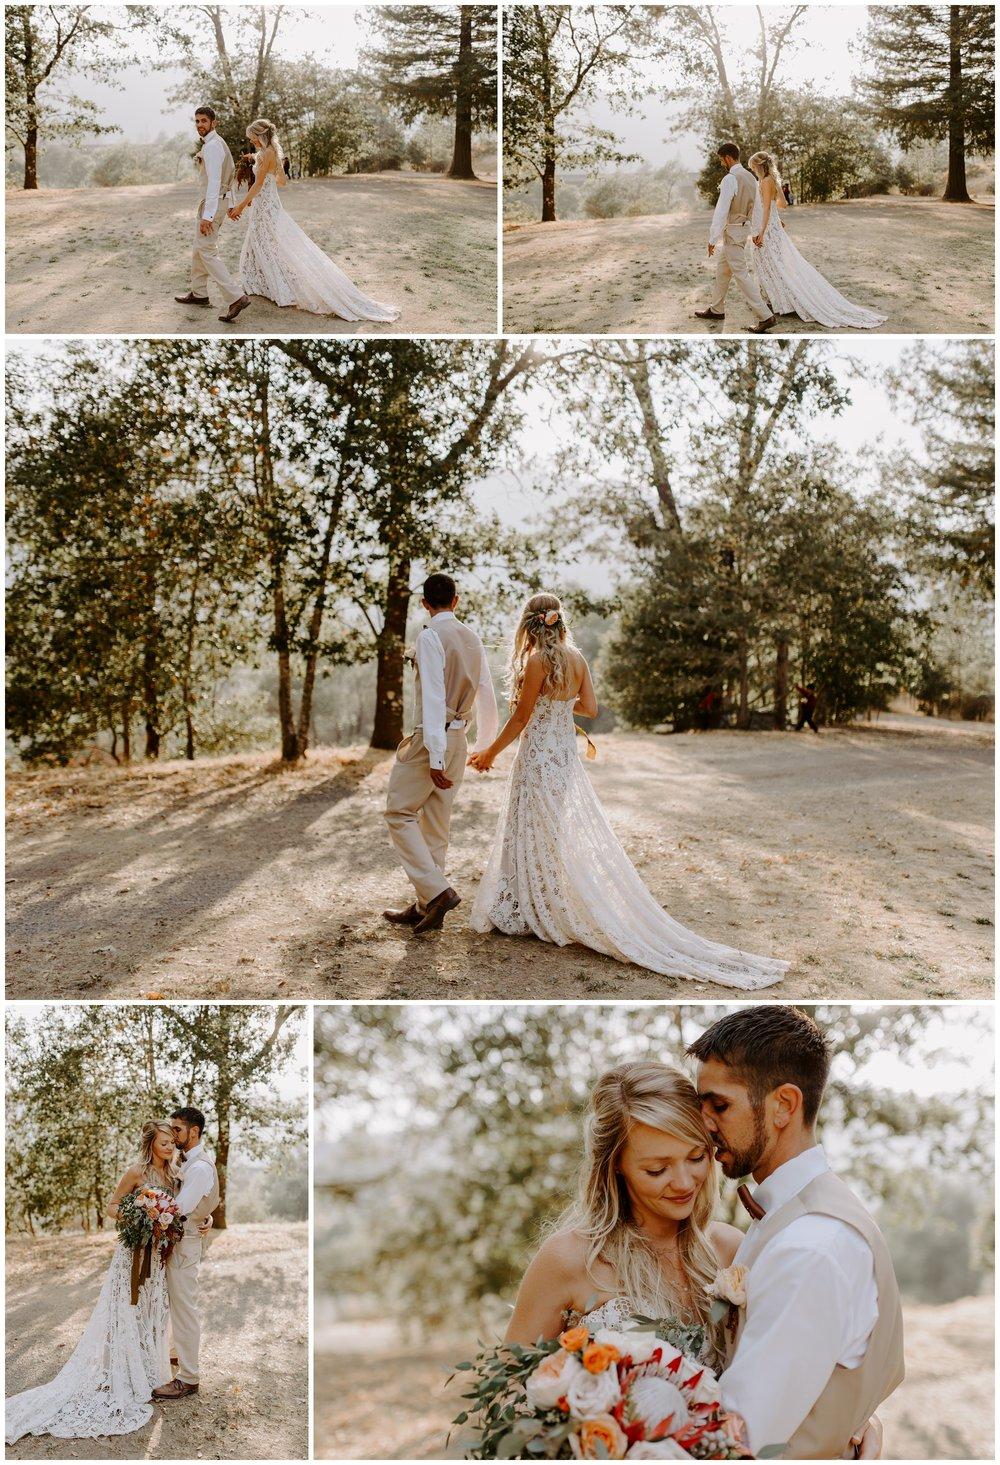 Redwood Festival Wedding Humbolt California - Jessica Heron Images_0046.jpg